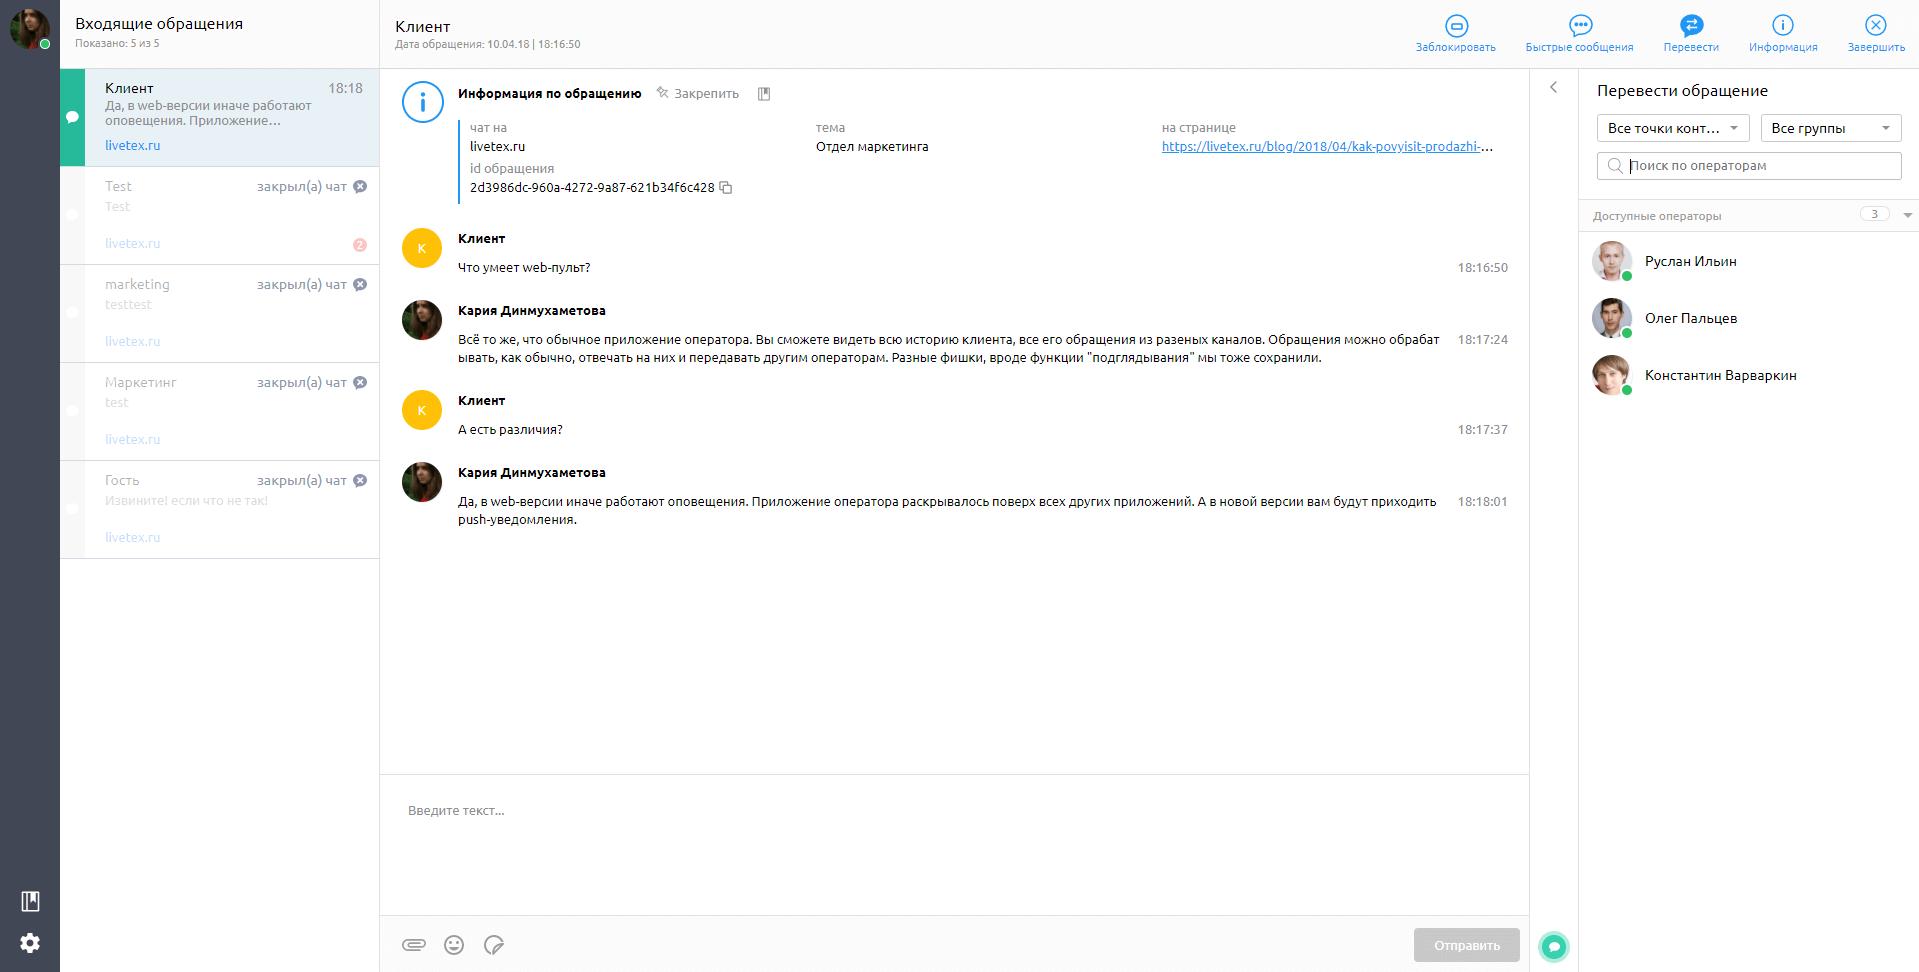 Web-версия Приложения оператора